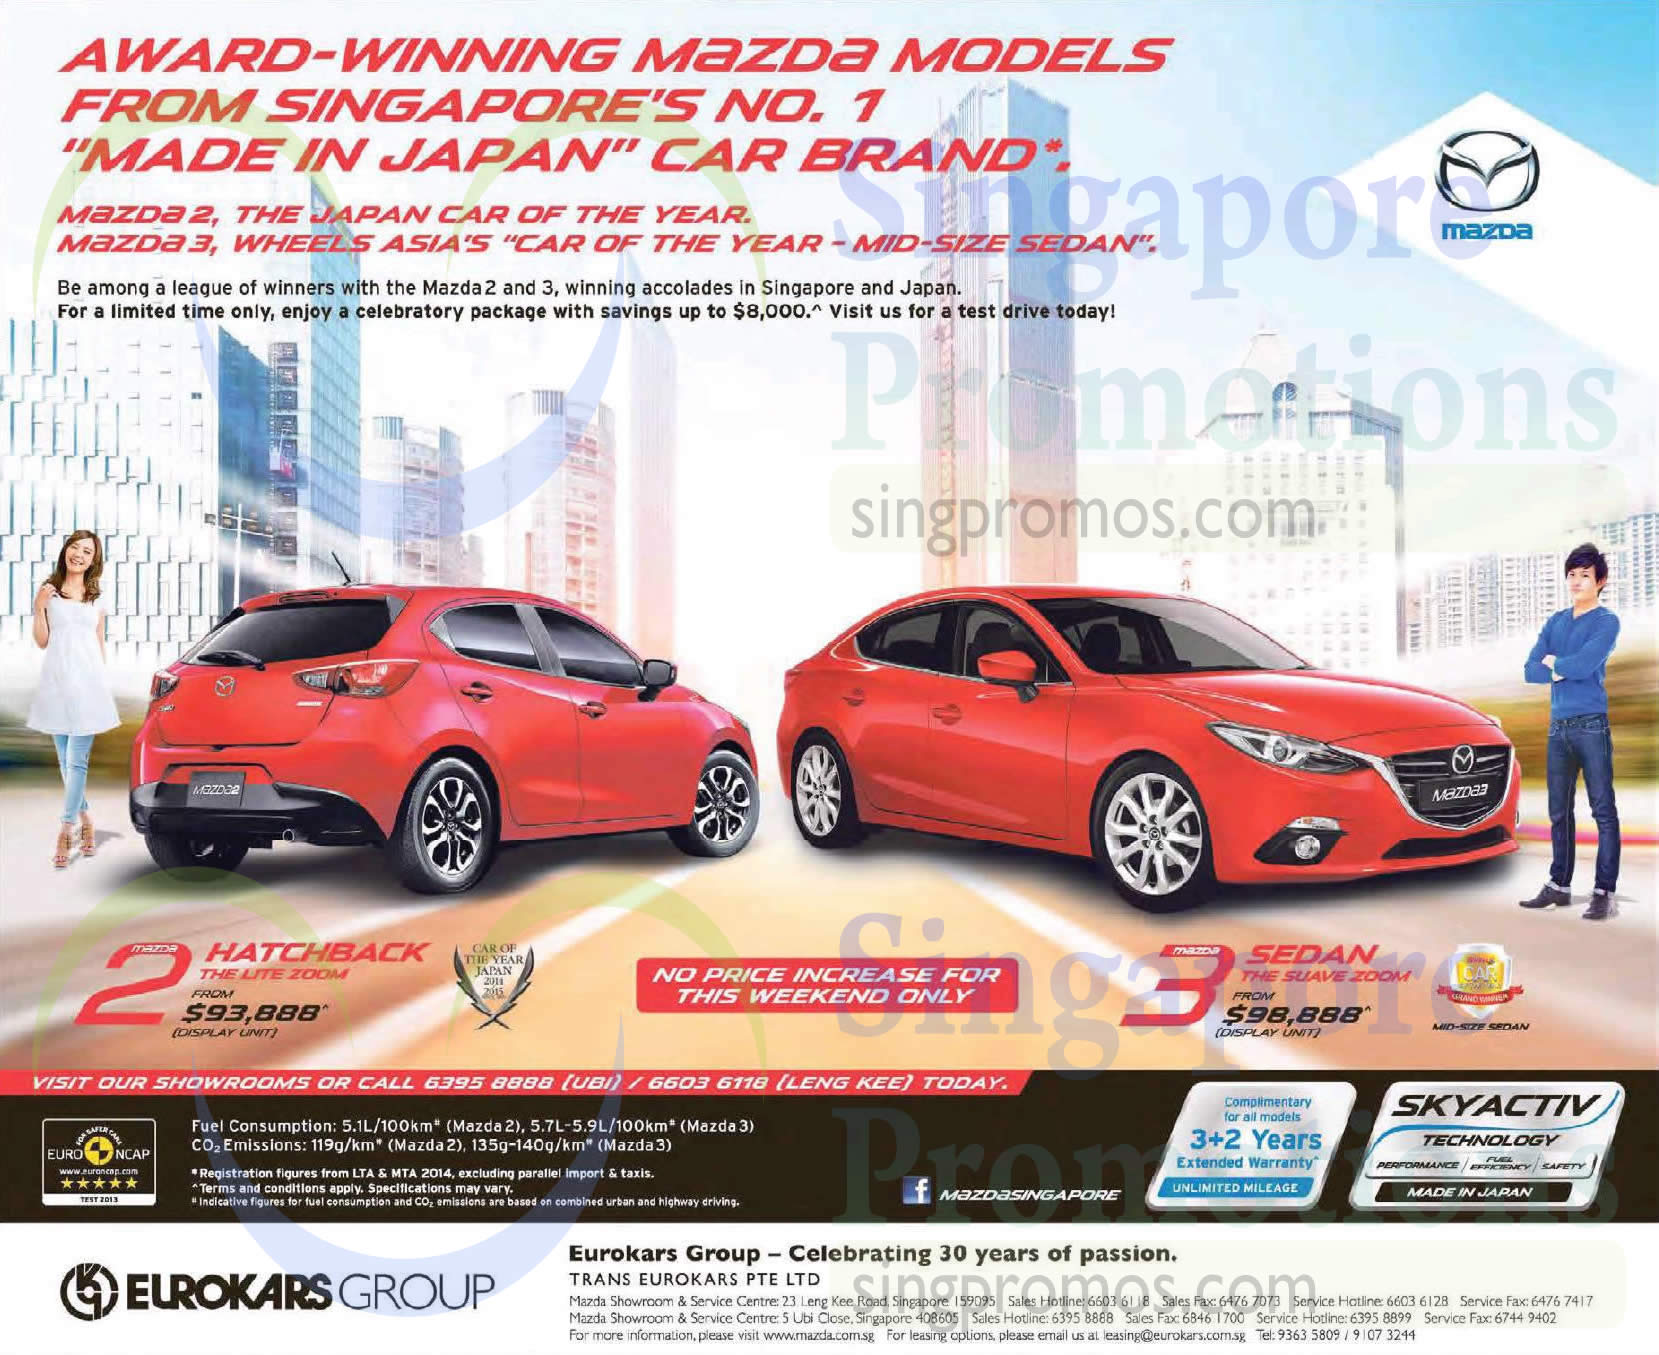 Mazda 2 Hatchback, 3 Sedan